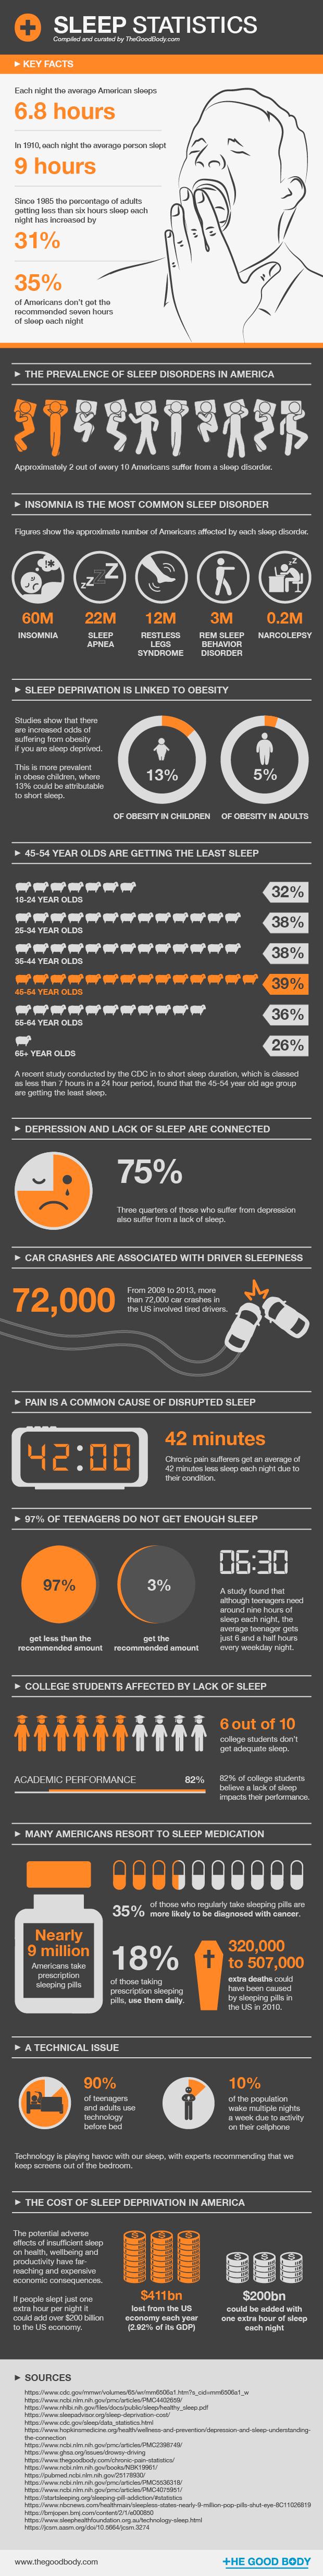 Sleep Statistics – infographic